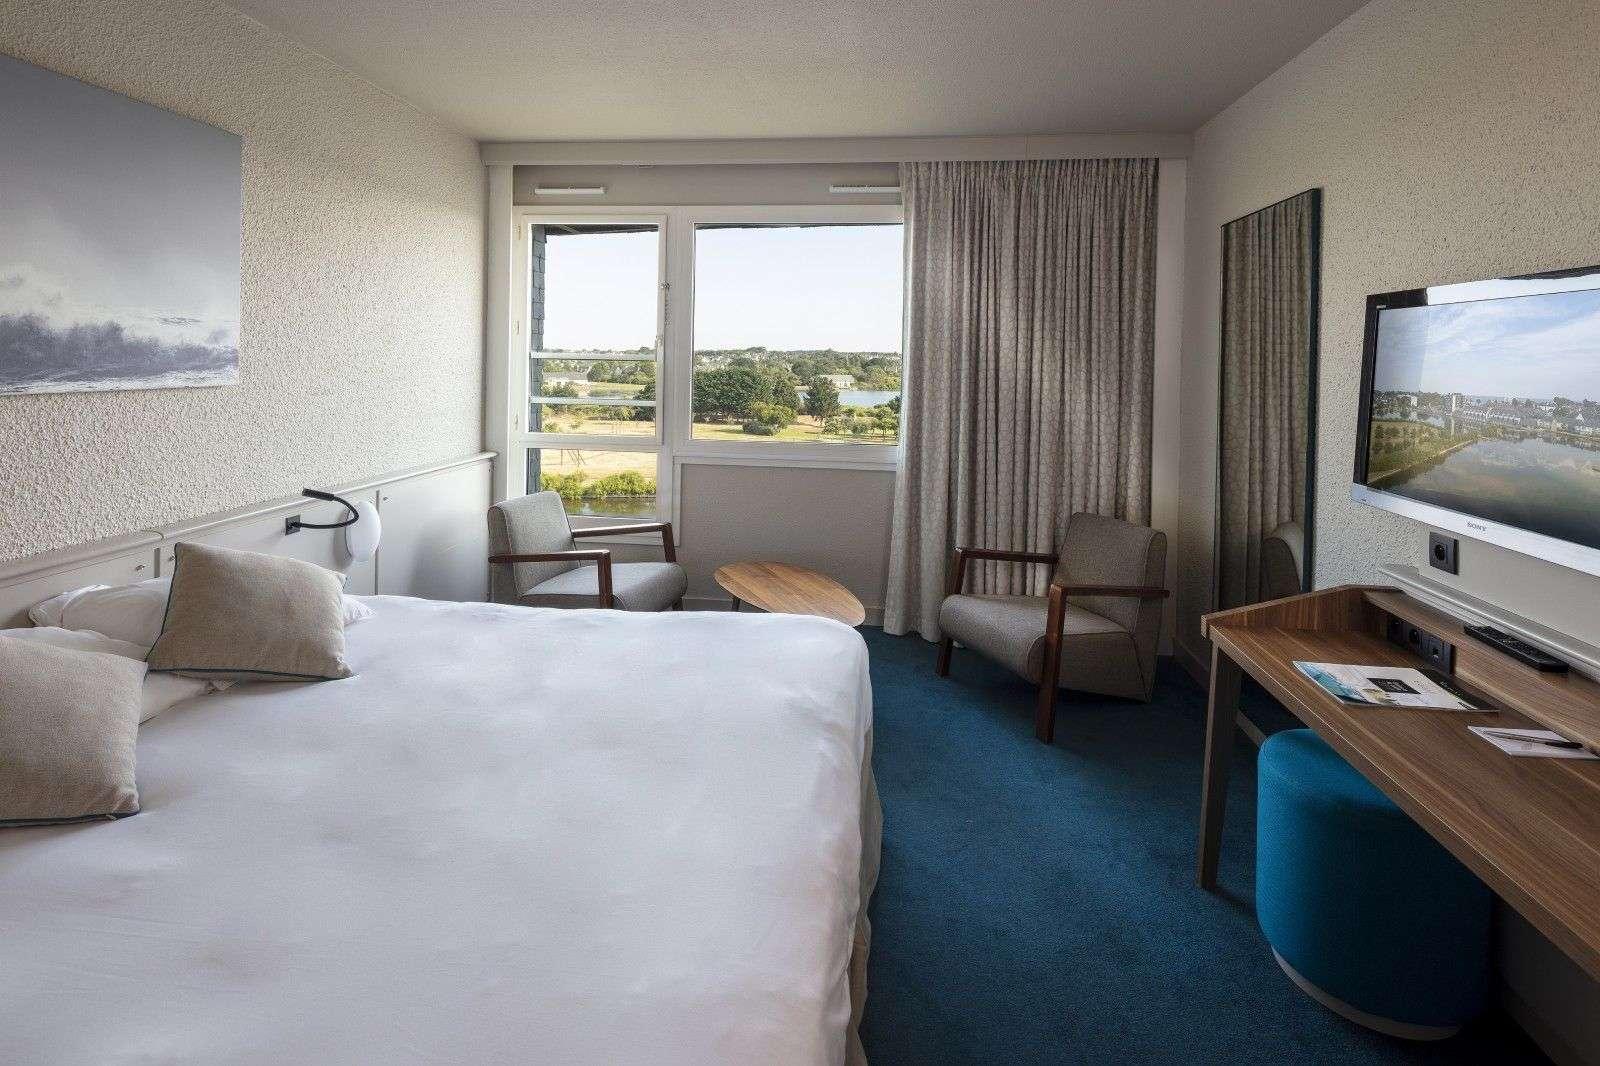 hotel-thalazur-Carnac-chambre8